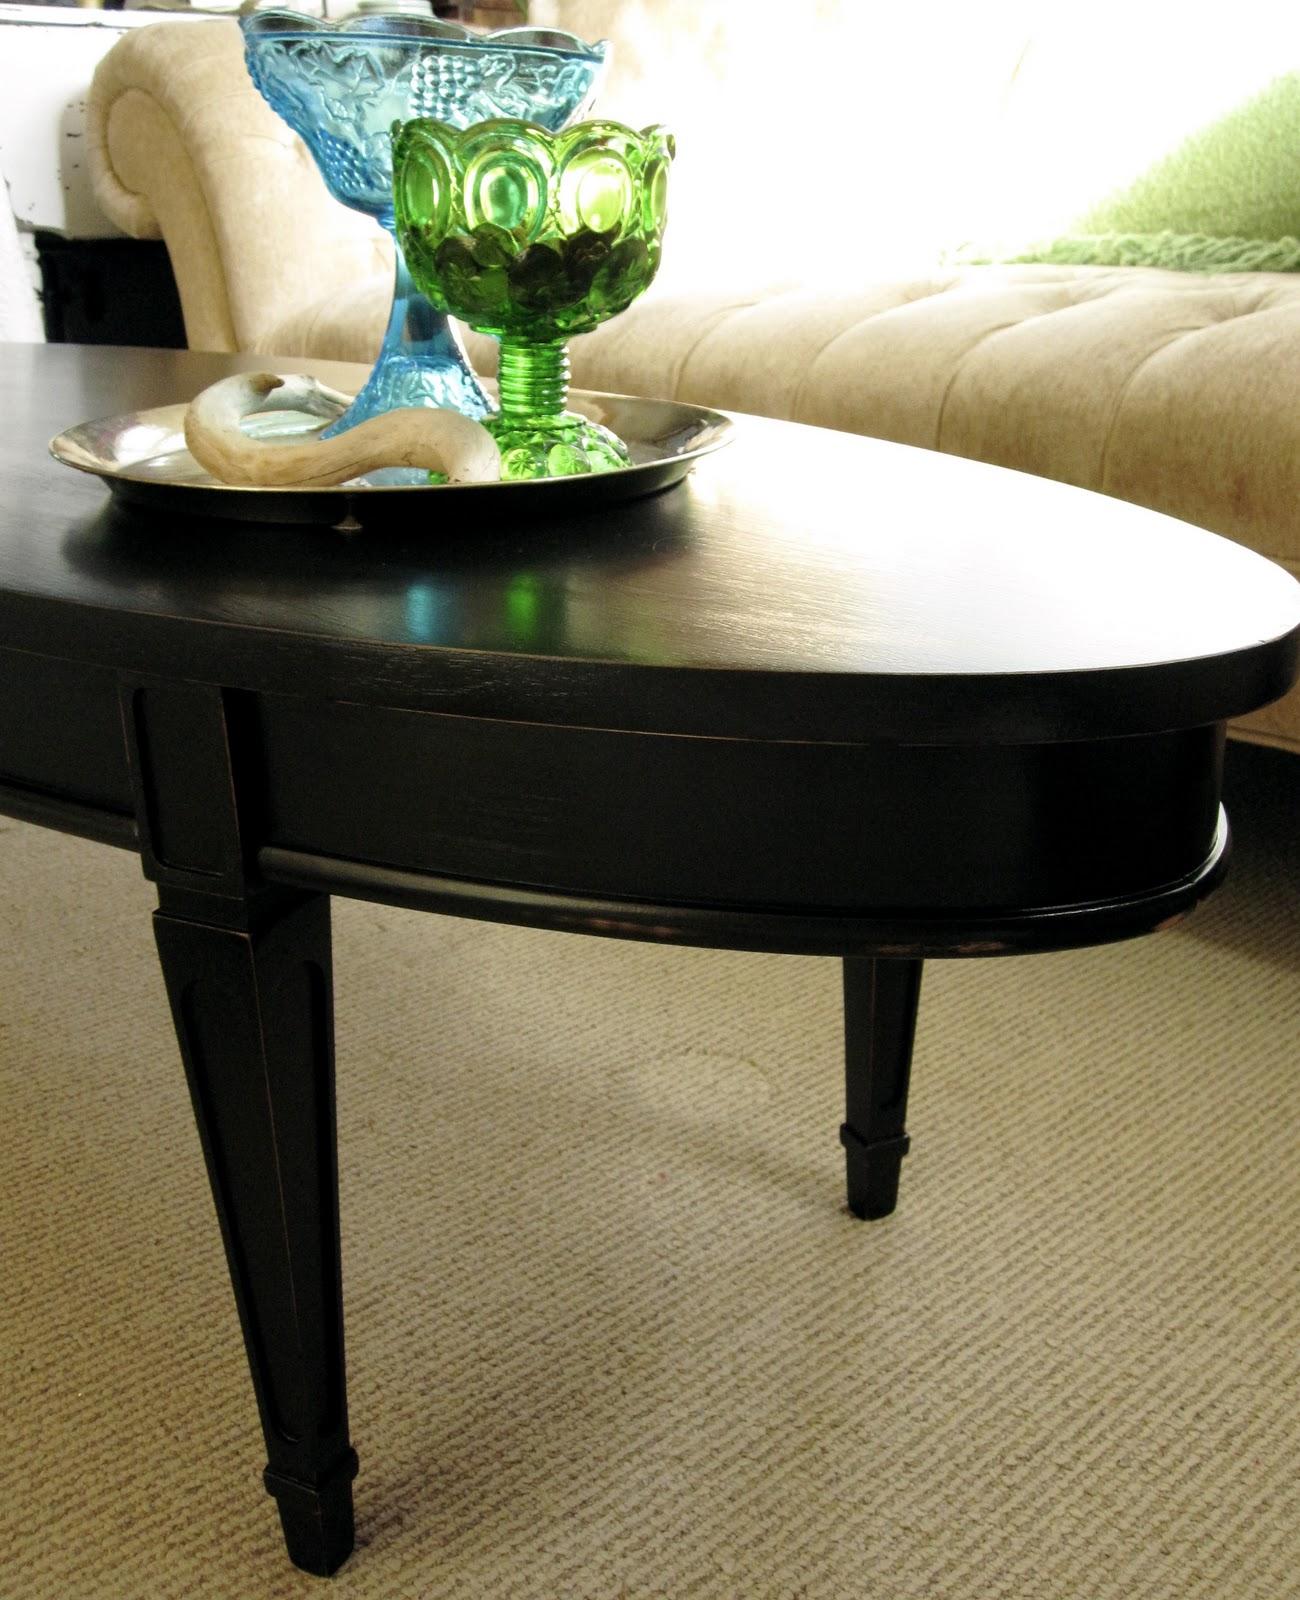 Sweet Tree Furniture: Black Oval Coffee Table